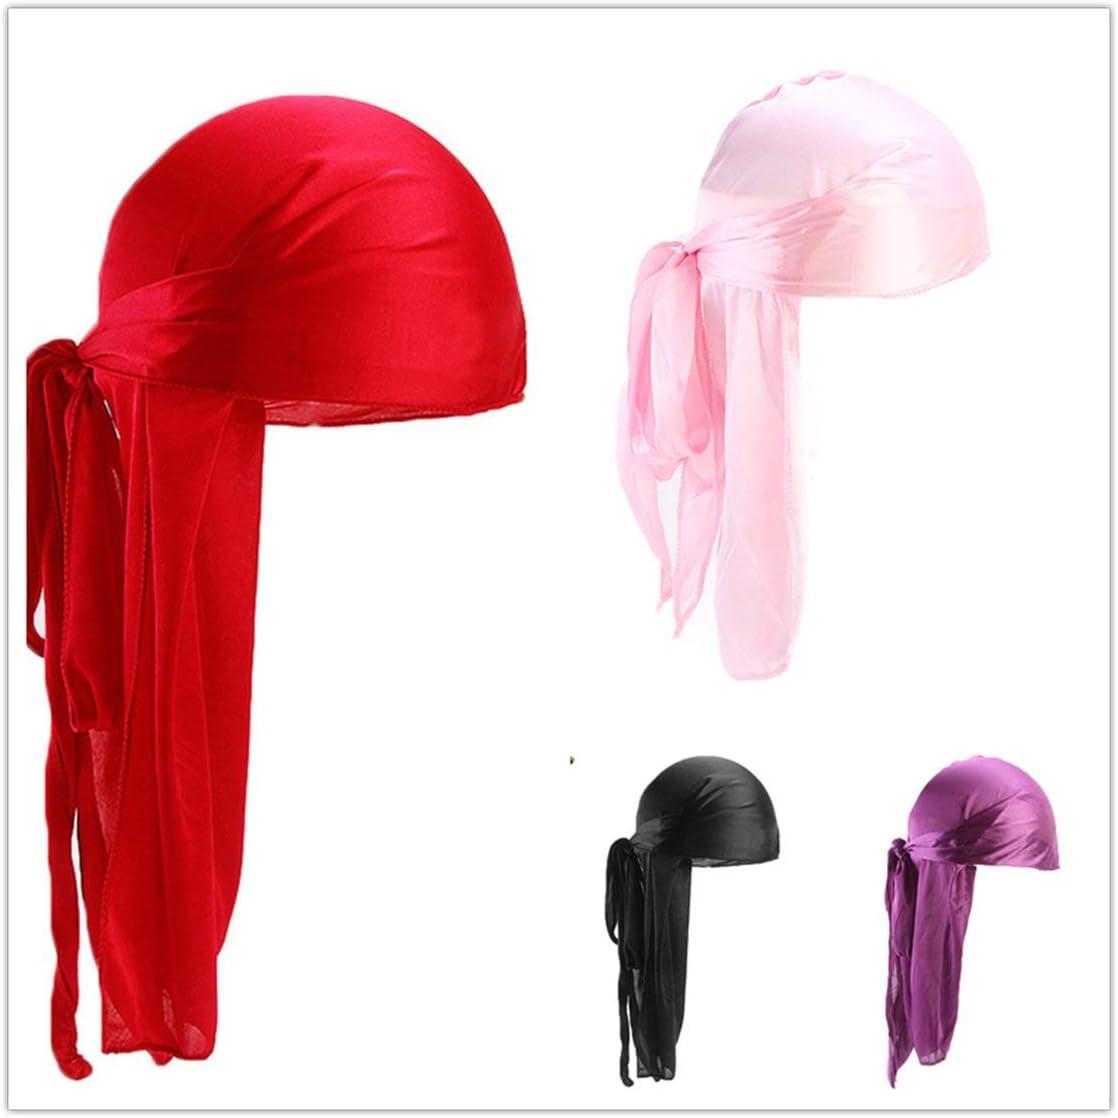 guoxuEE Hommes Femmes Soie Satin Respirant Soyeux Durag 360 Wave Cool Bandana Chapeau Turban